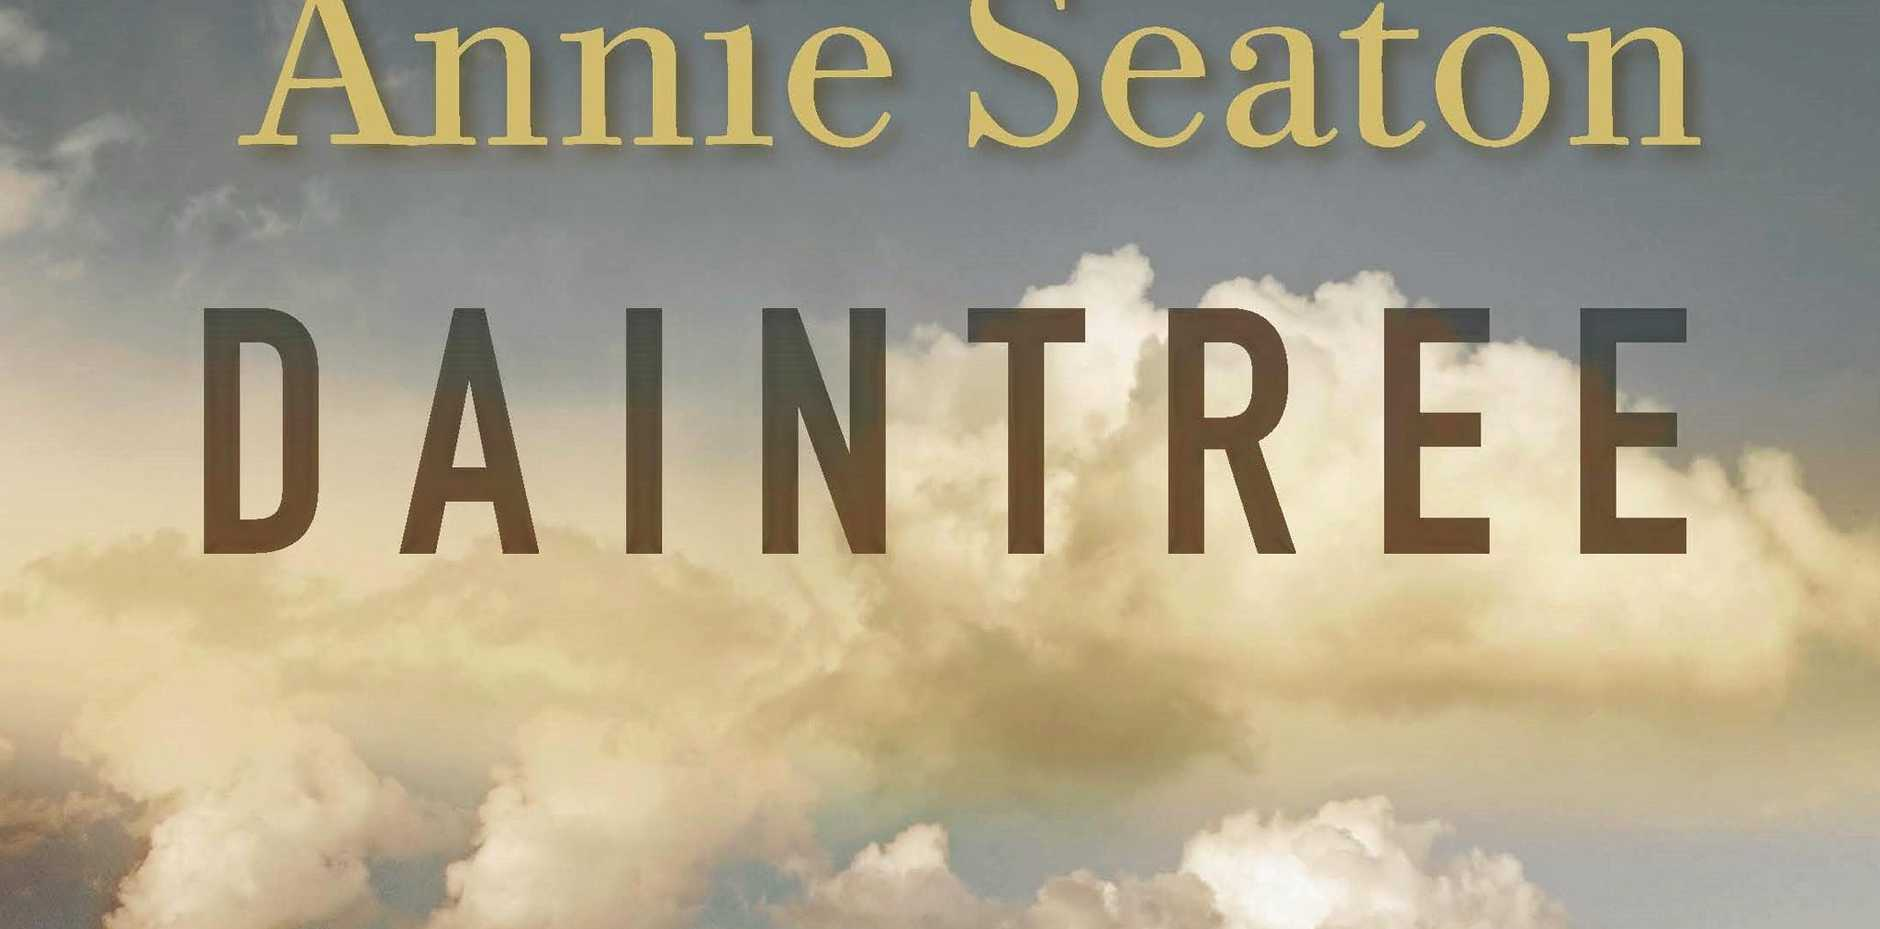 BOOK COVER: Annie Seaton's latest novel \